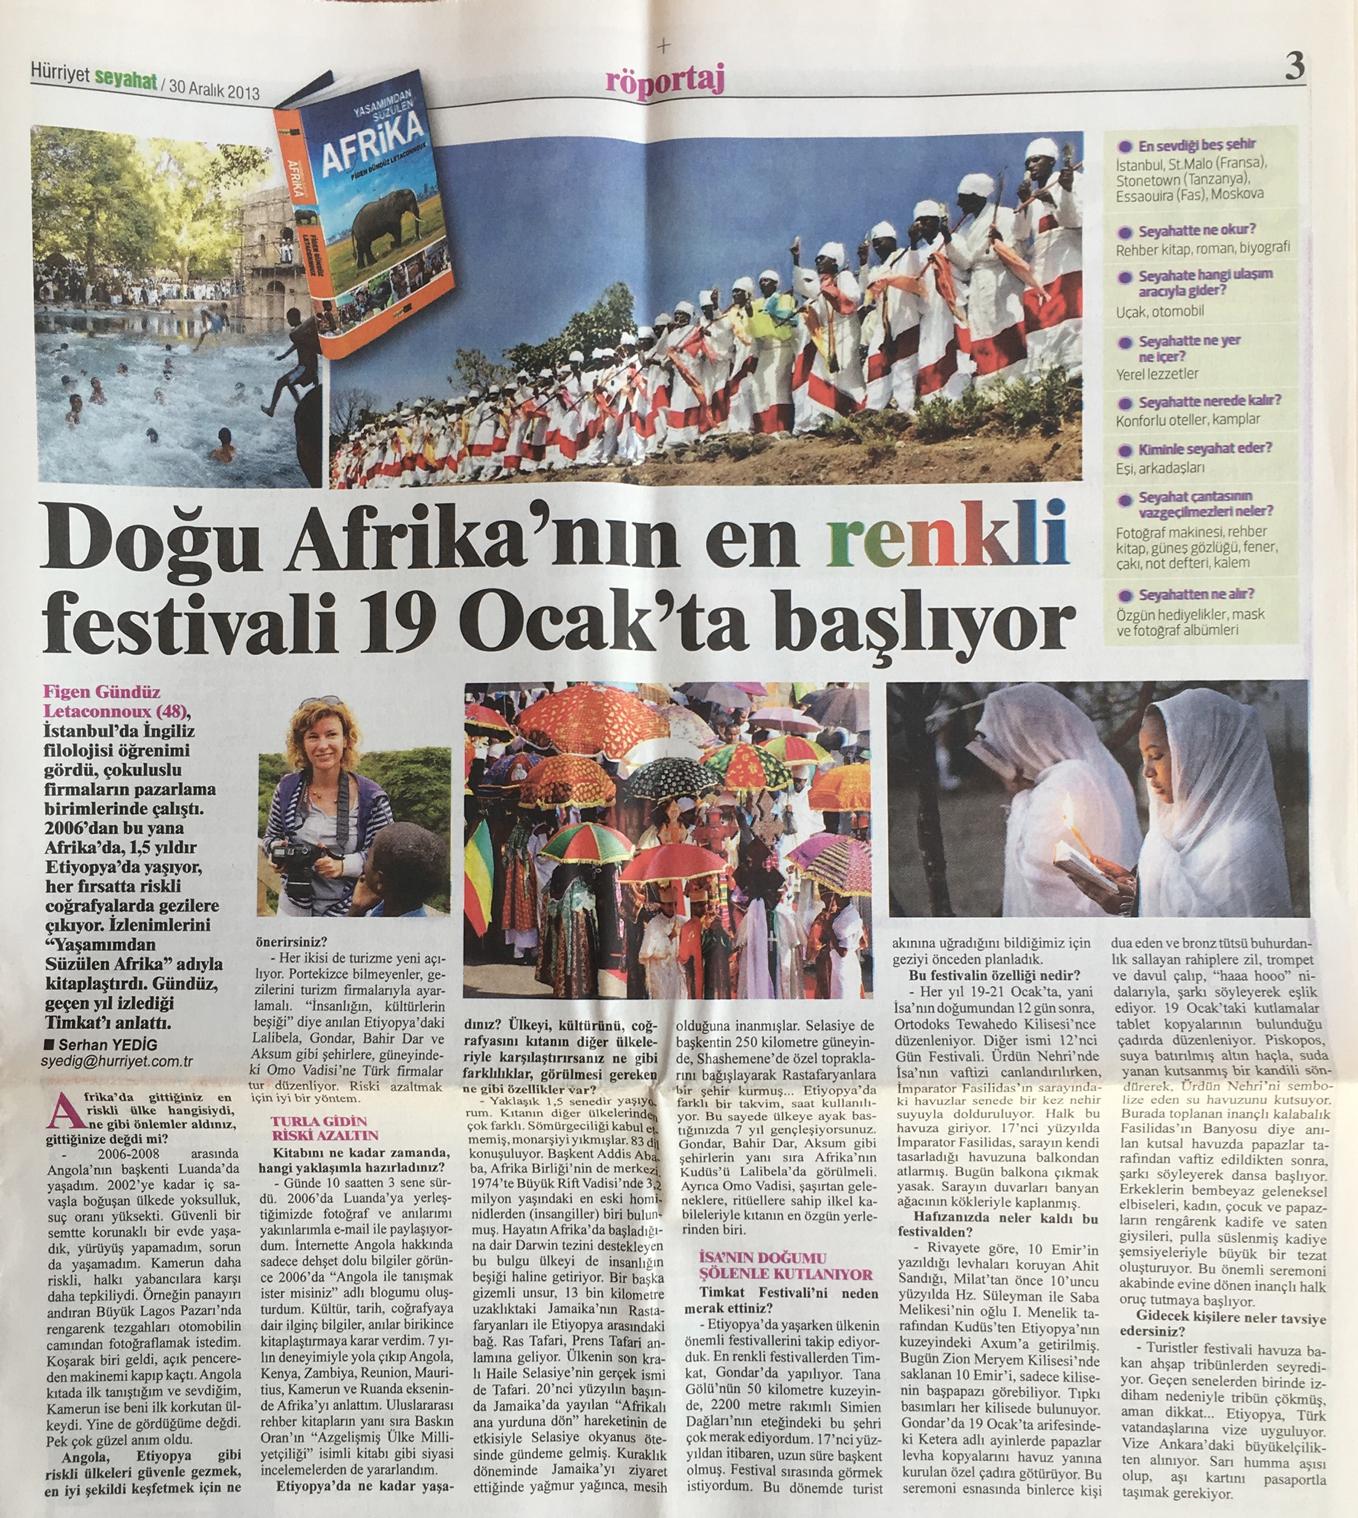 GazeteHaberiFigenGunduzLettaconnoux1